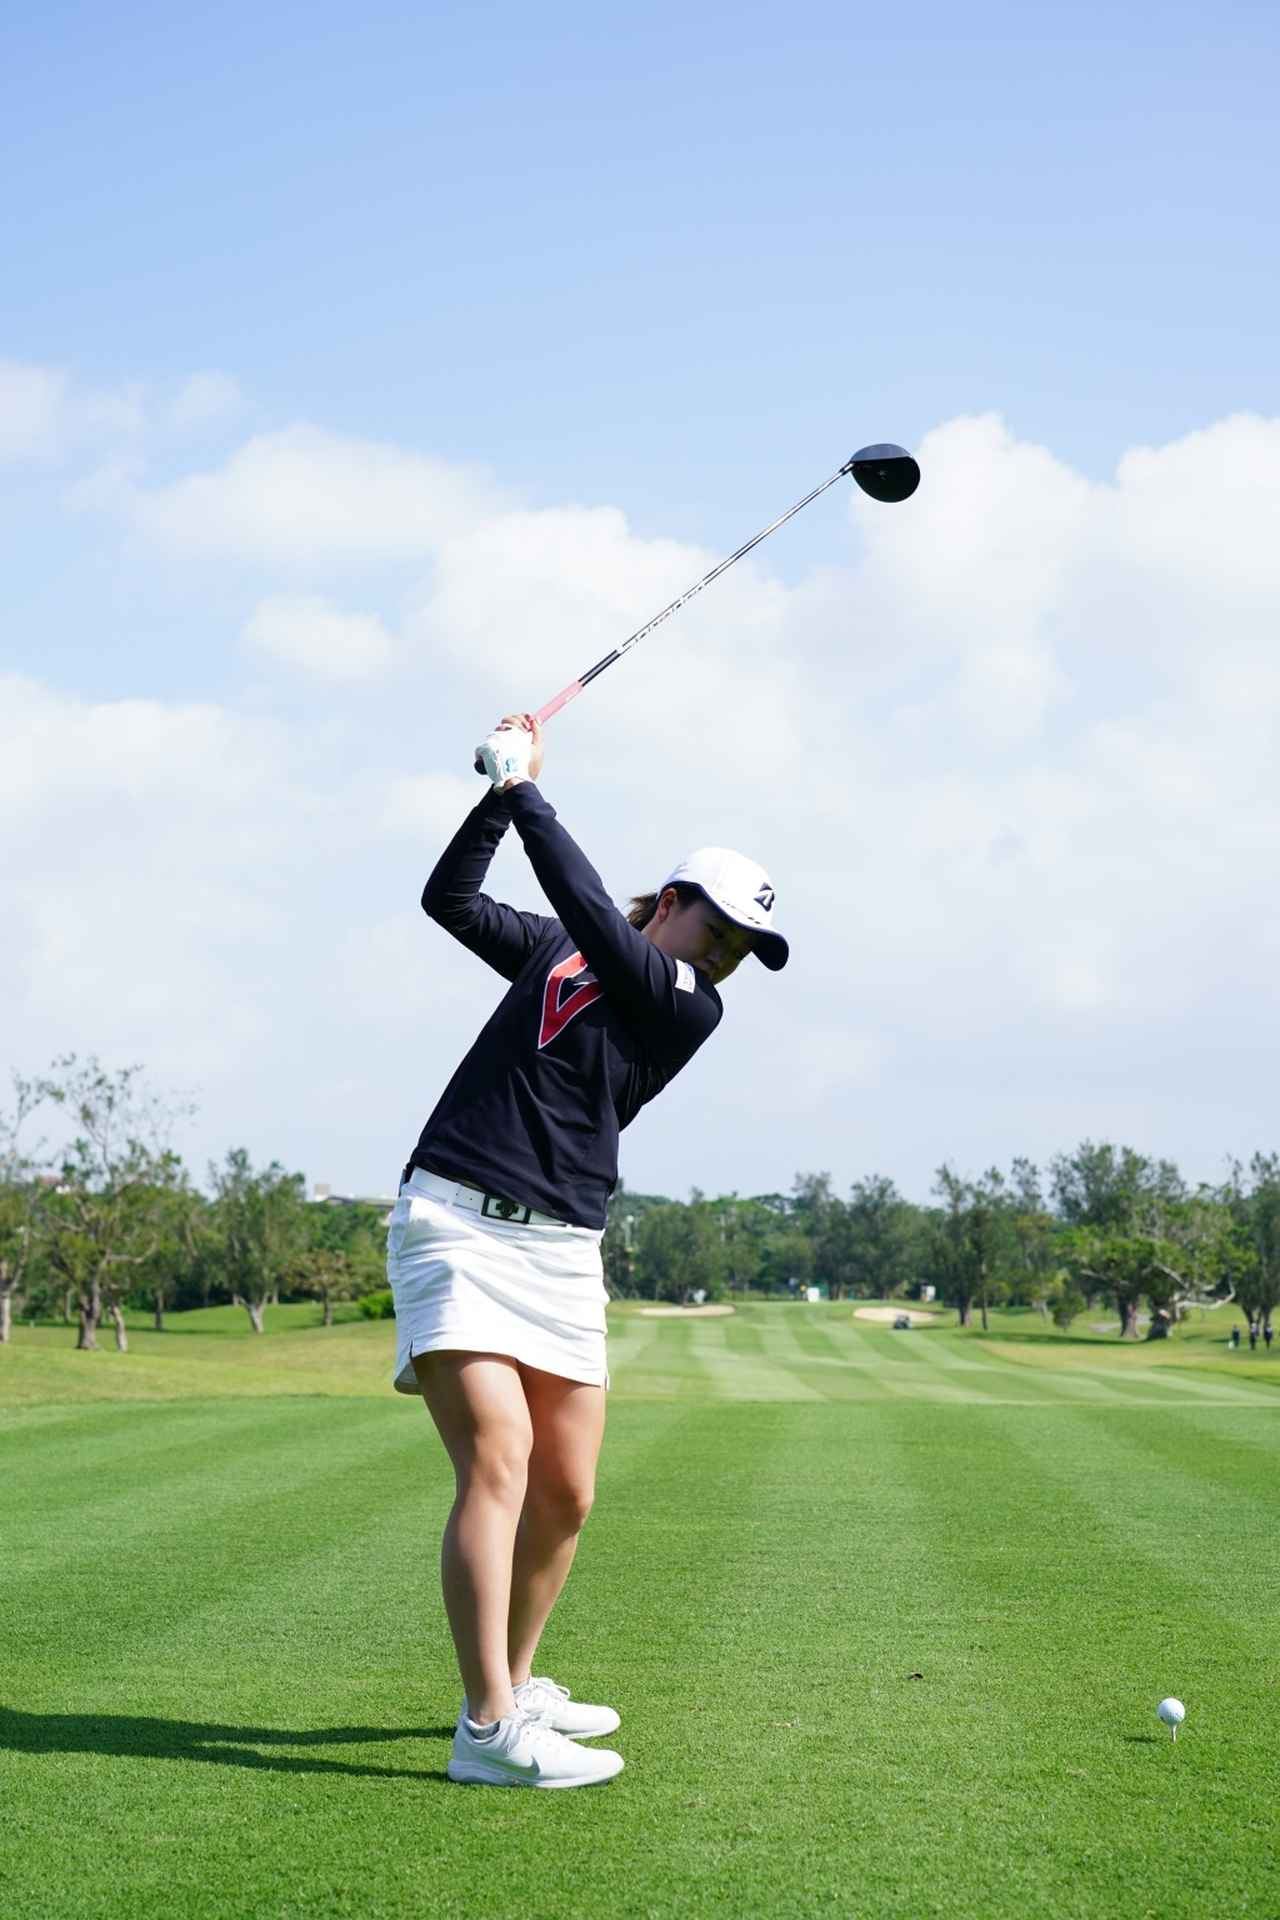 Images : 6番目の画像 - 丹萌乃のドライバー連続写真 - みんなのゴルフダイジェスト